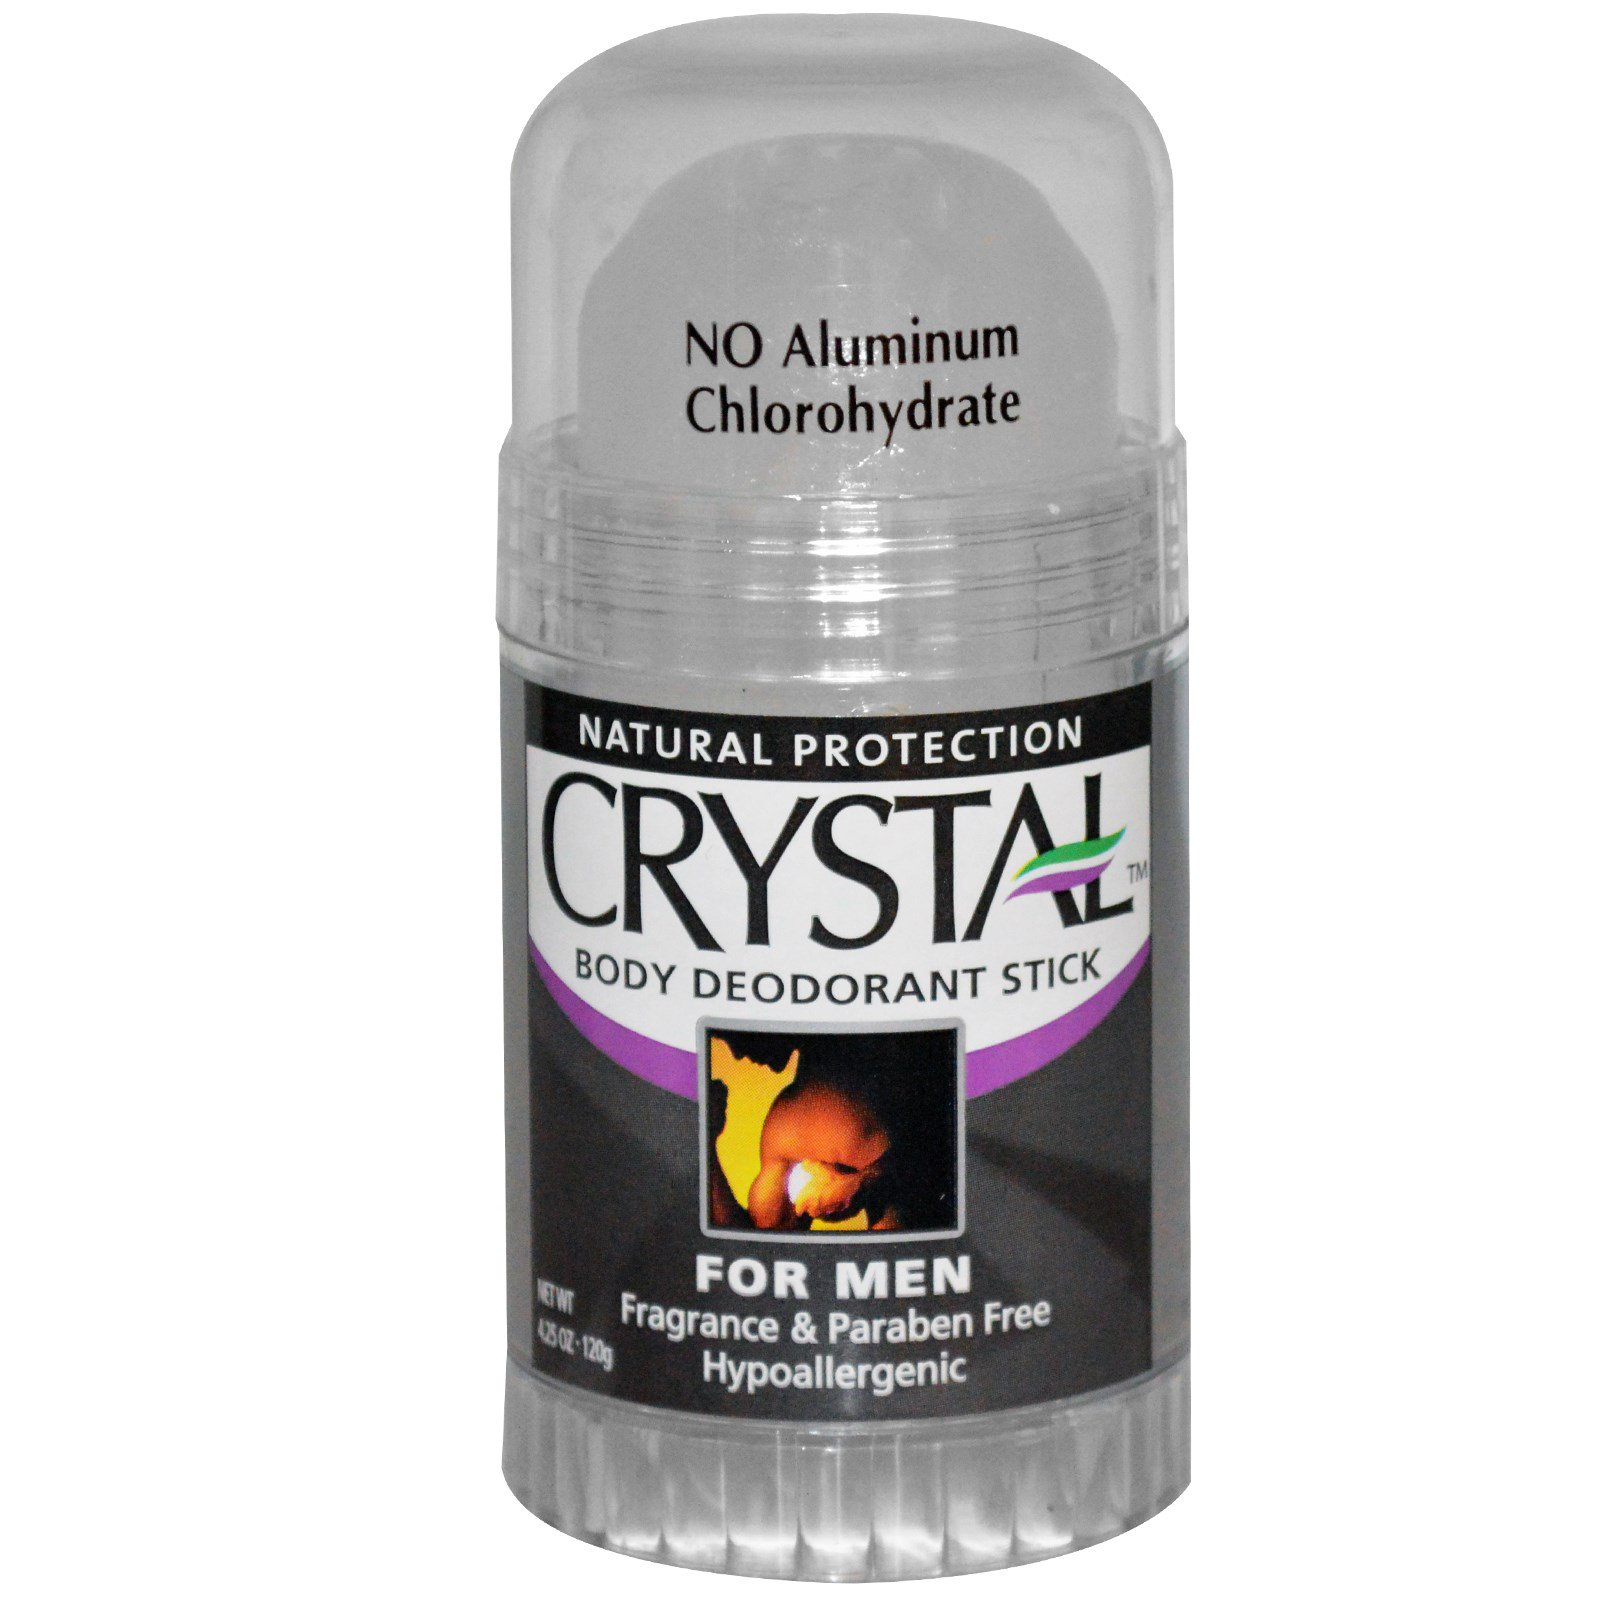 Crystal Body Deodorant, Мужской дезодорант-стик для тела, без запаха, 4.25 унций (120 г)